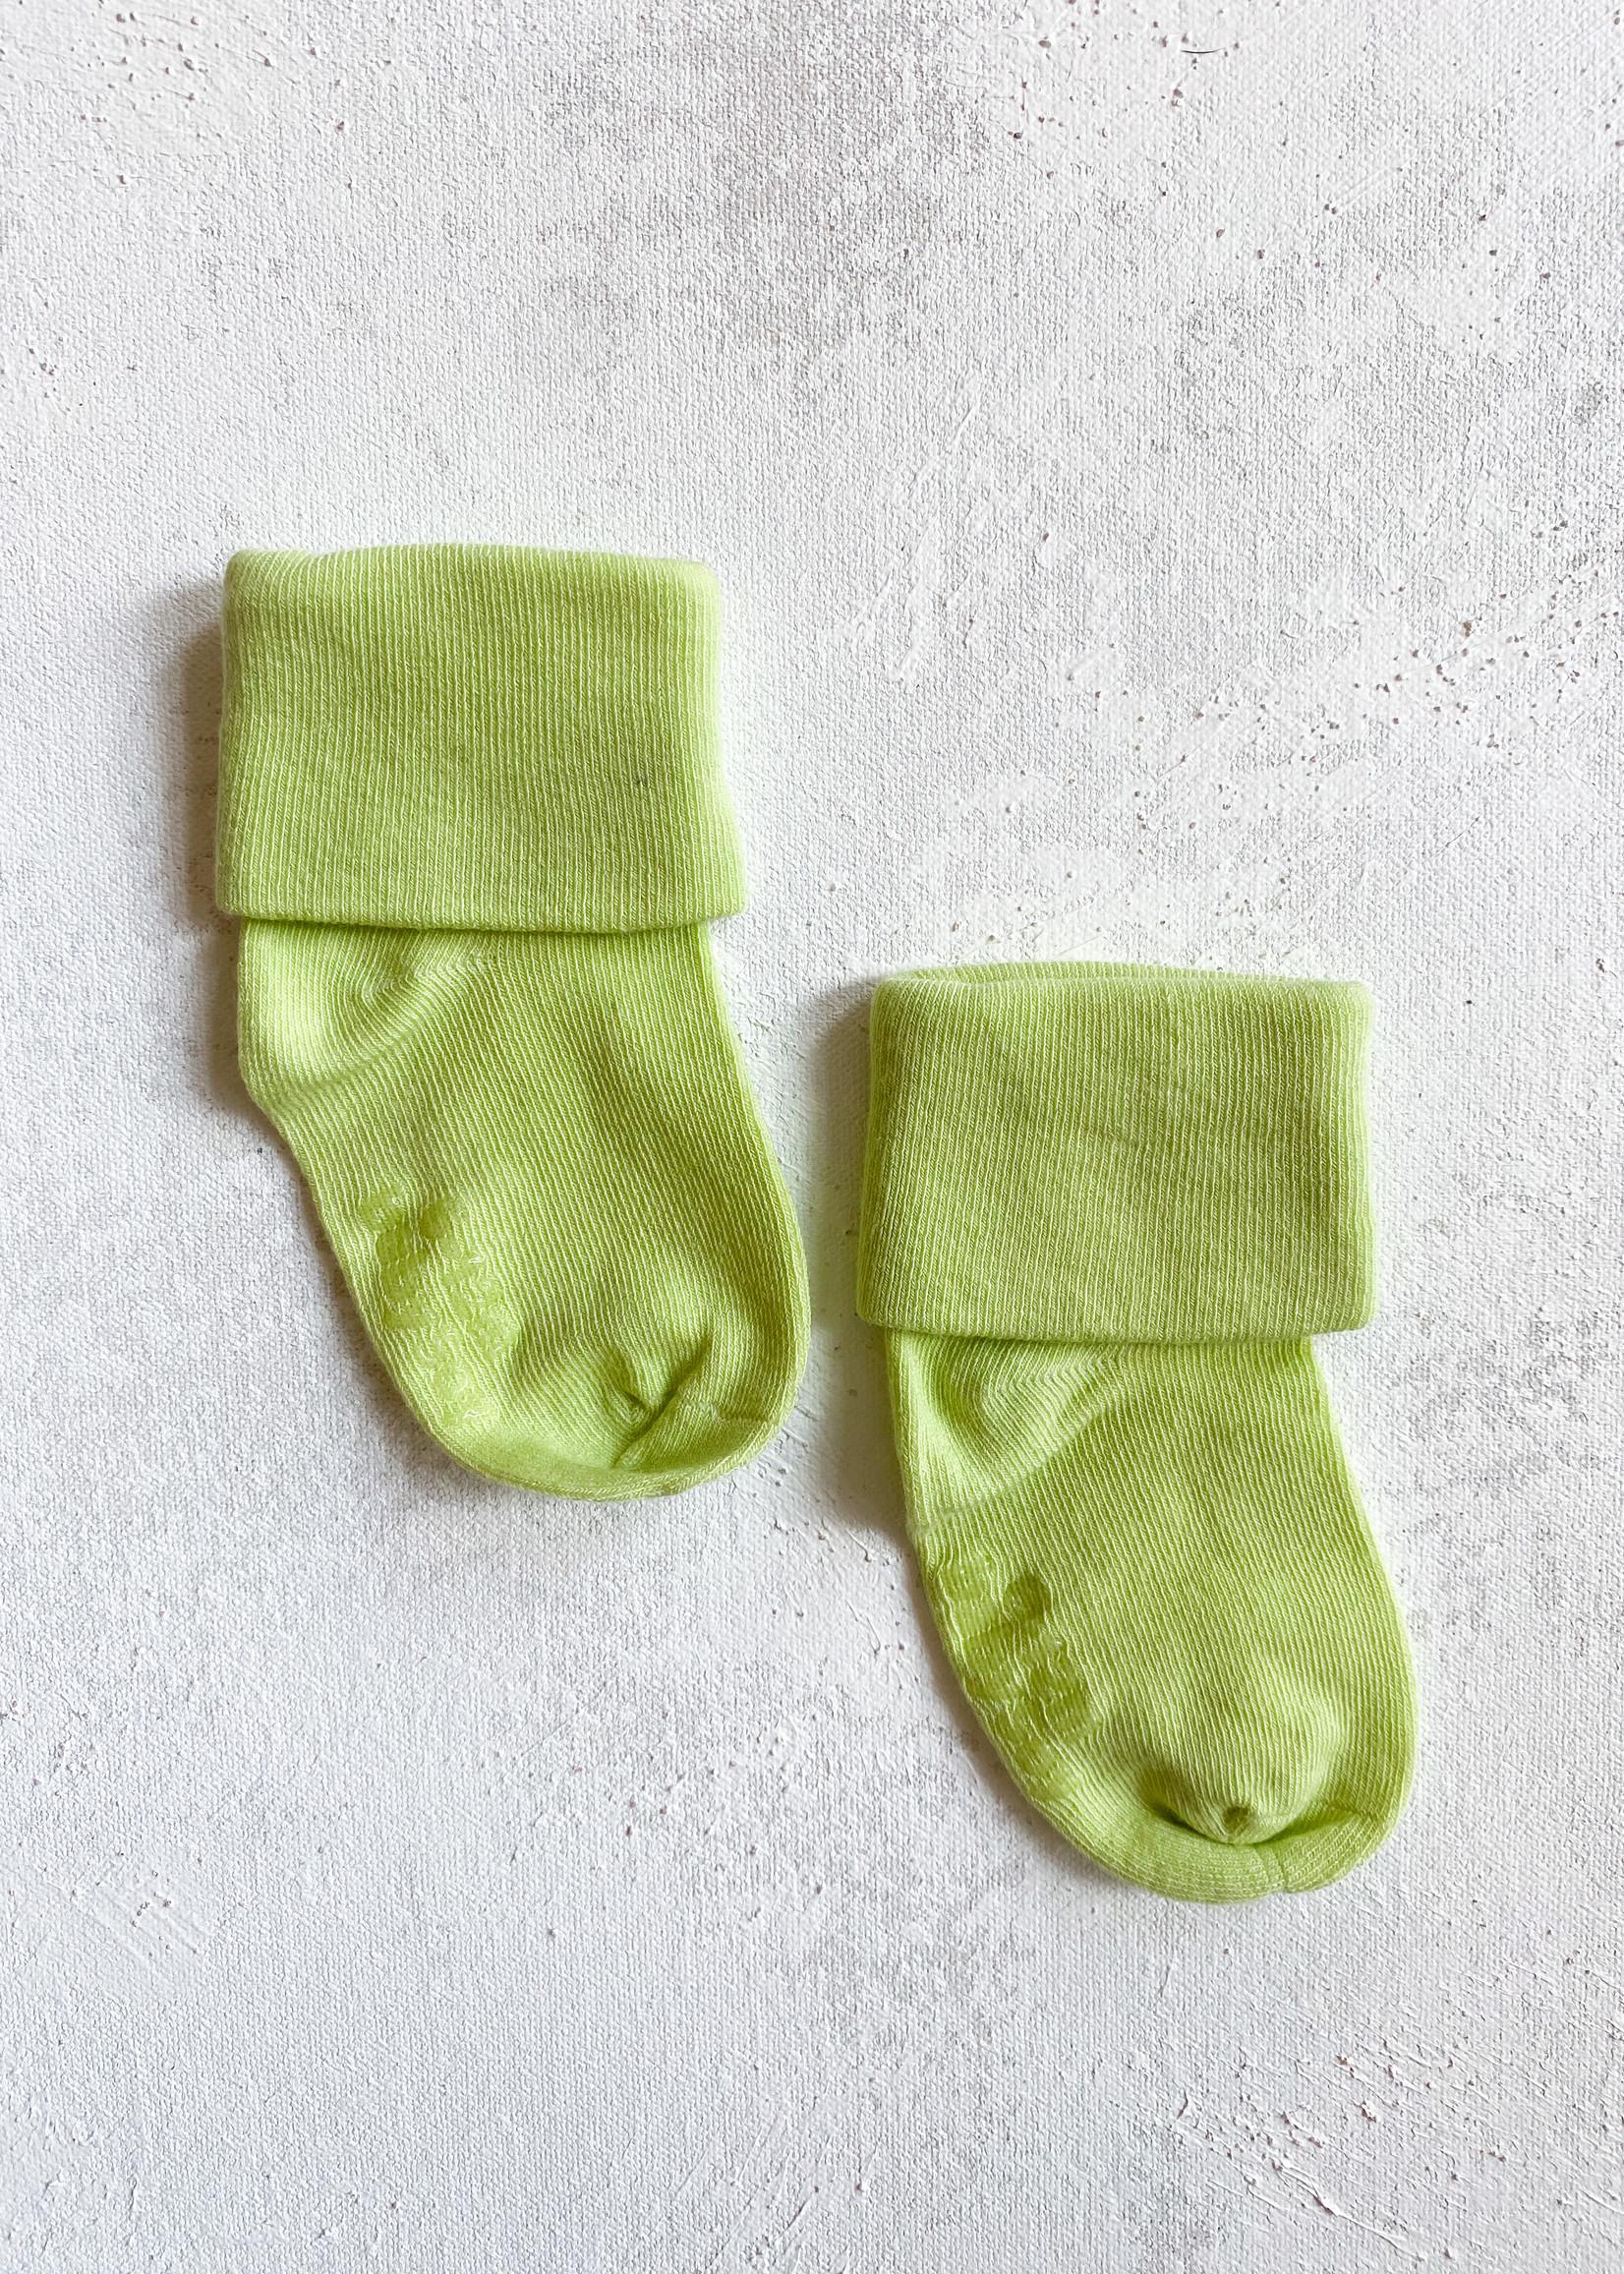 Elitaire Petite Modern Socks in Meadow